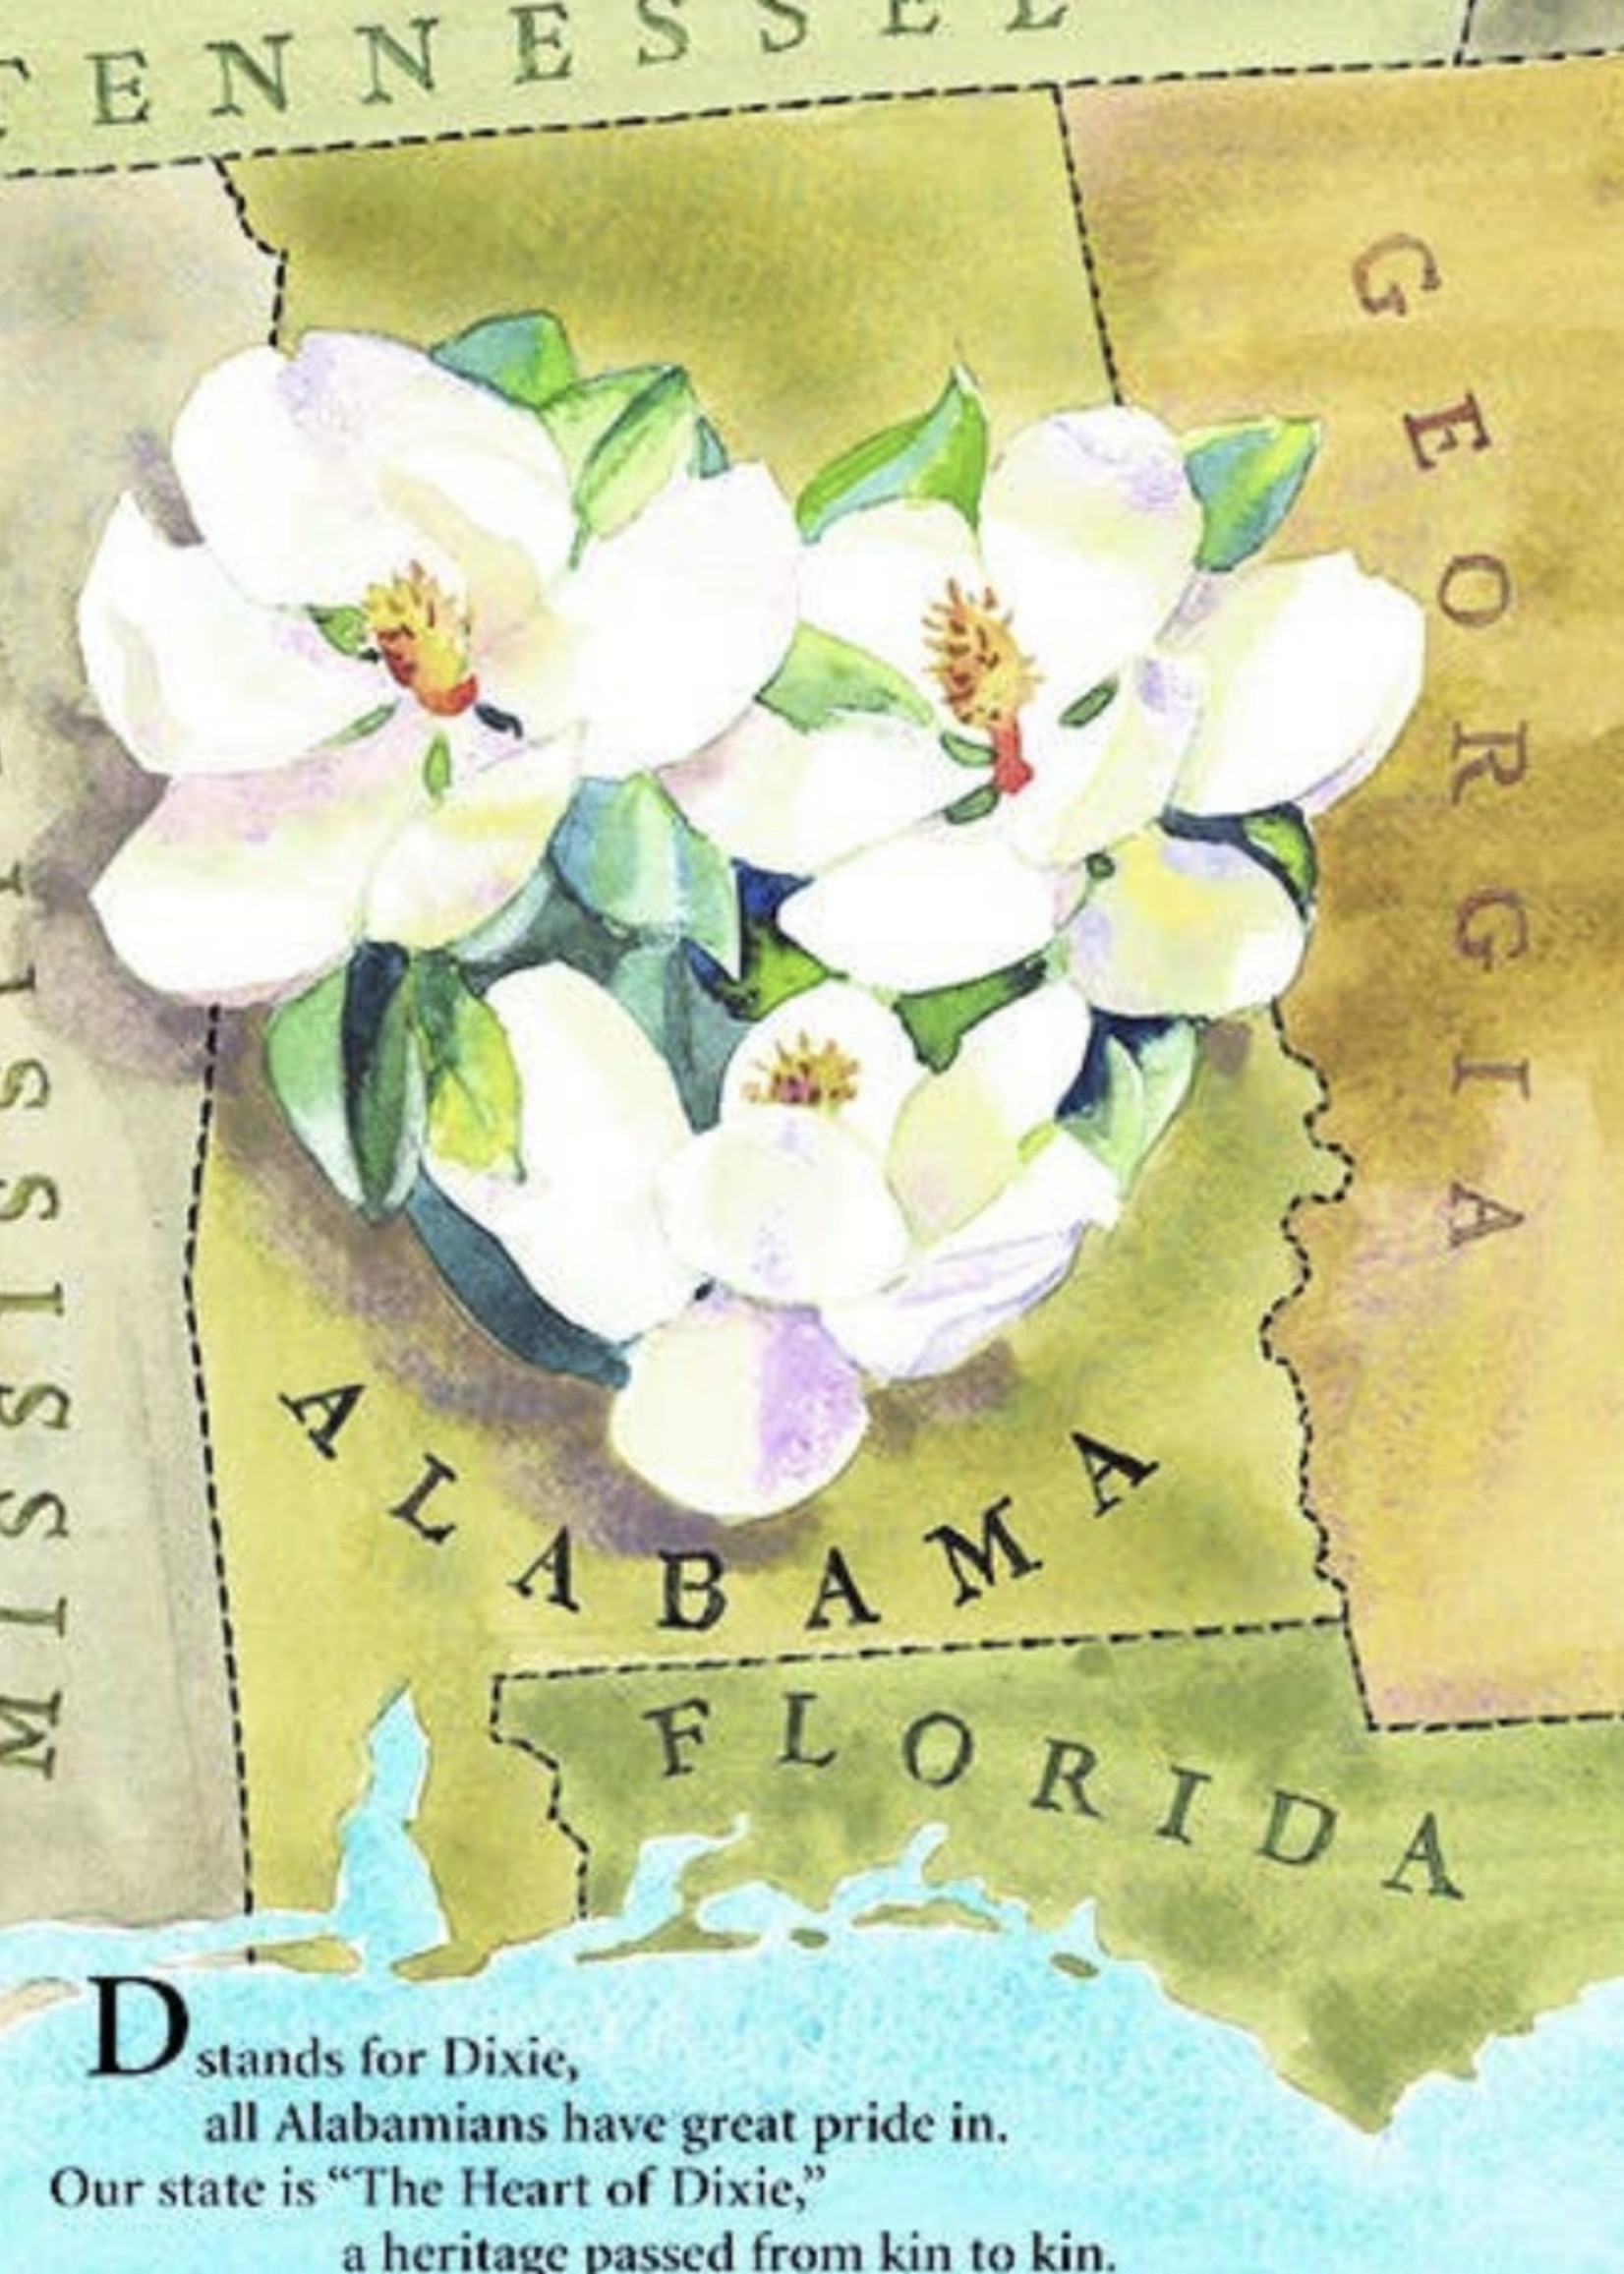 Sleeping bear press An Alabama Alphabet: Y is for yellowhammer